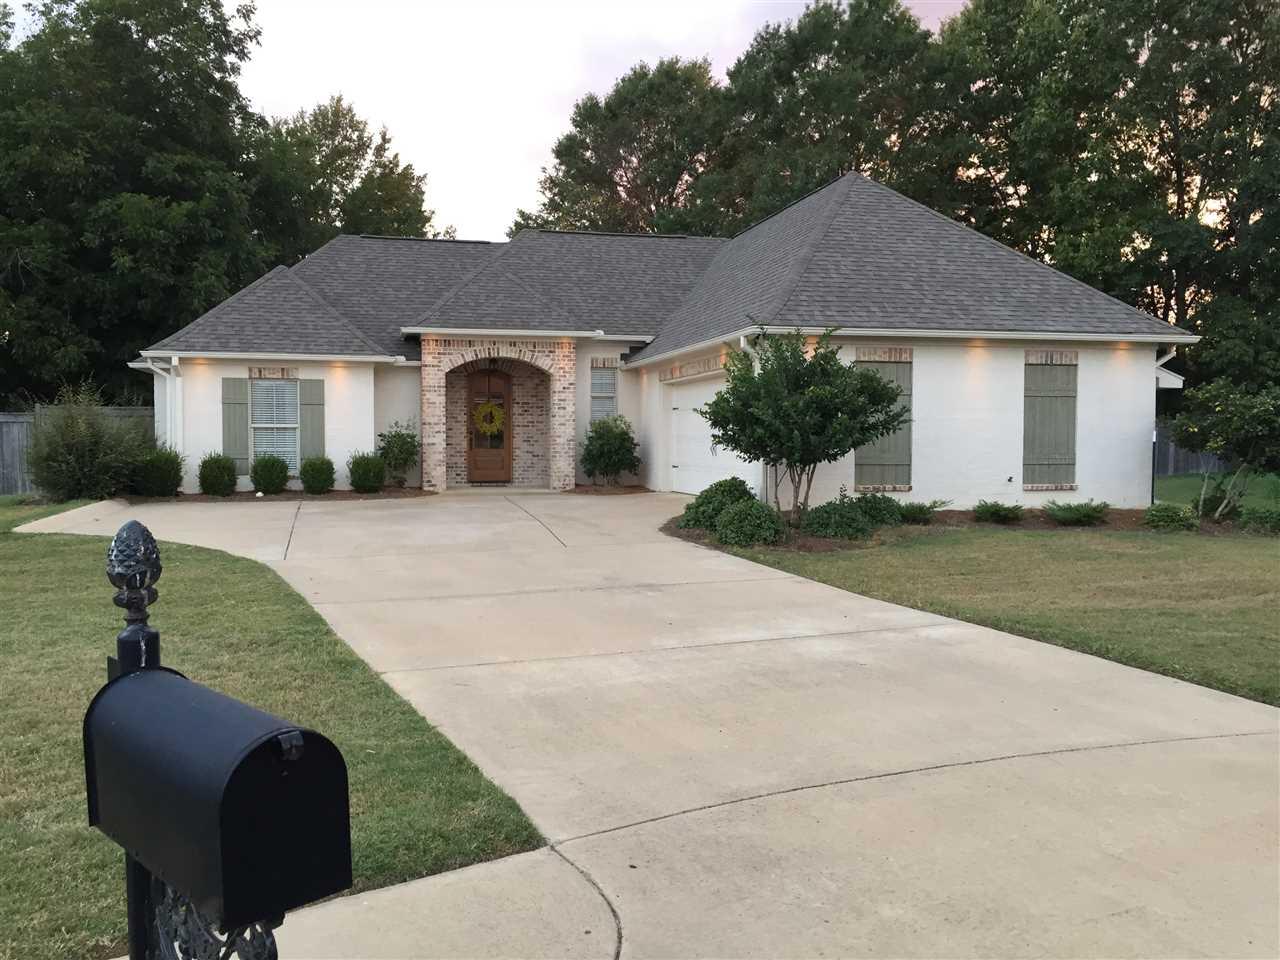 Rental Homes for Rent, ListingId:35144137, location: 251 BRIGADE AVE Madison 39110